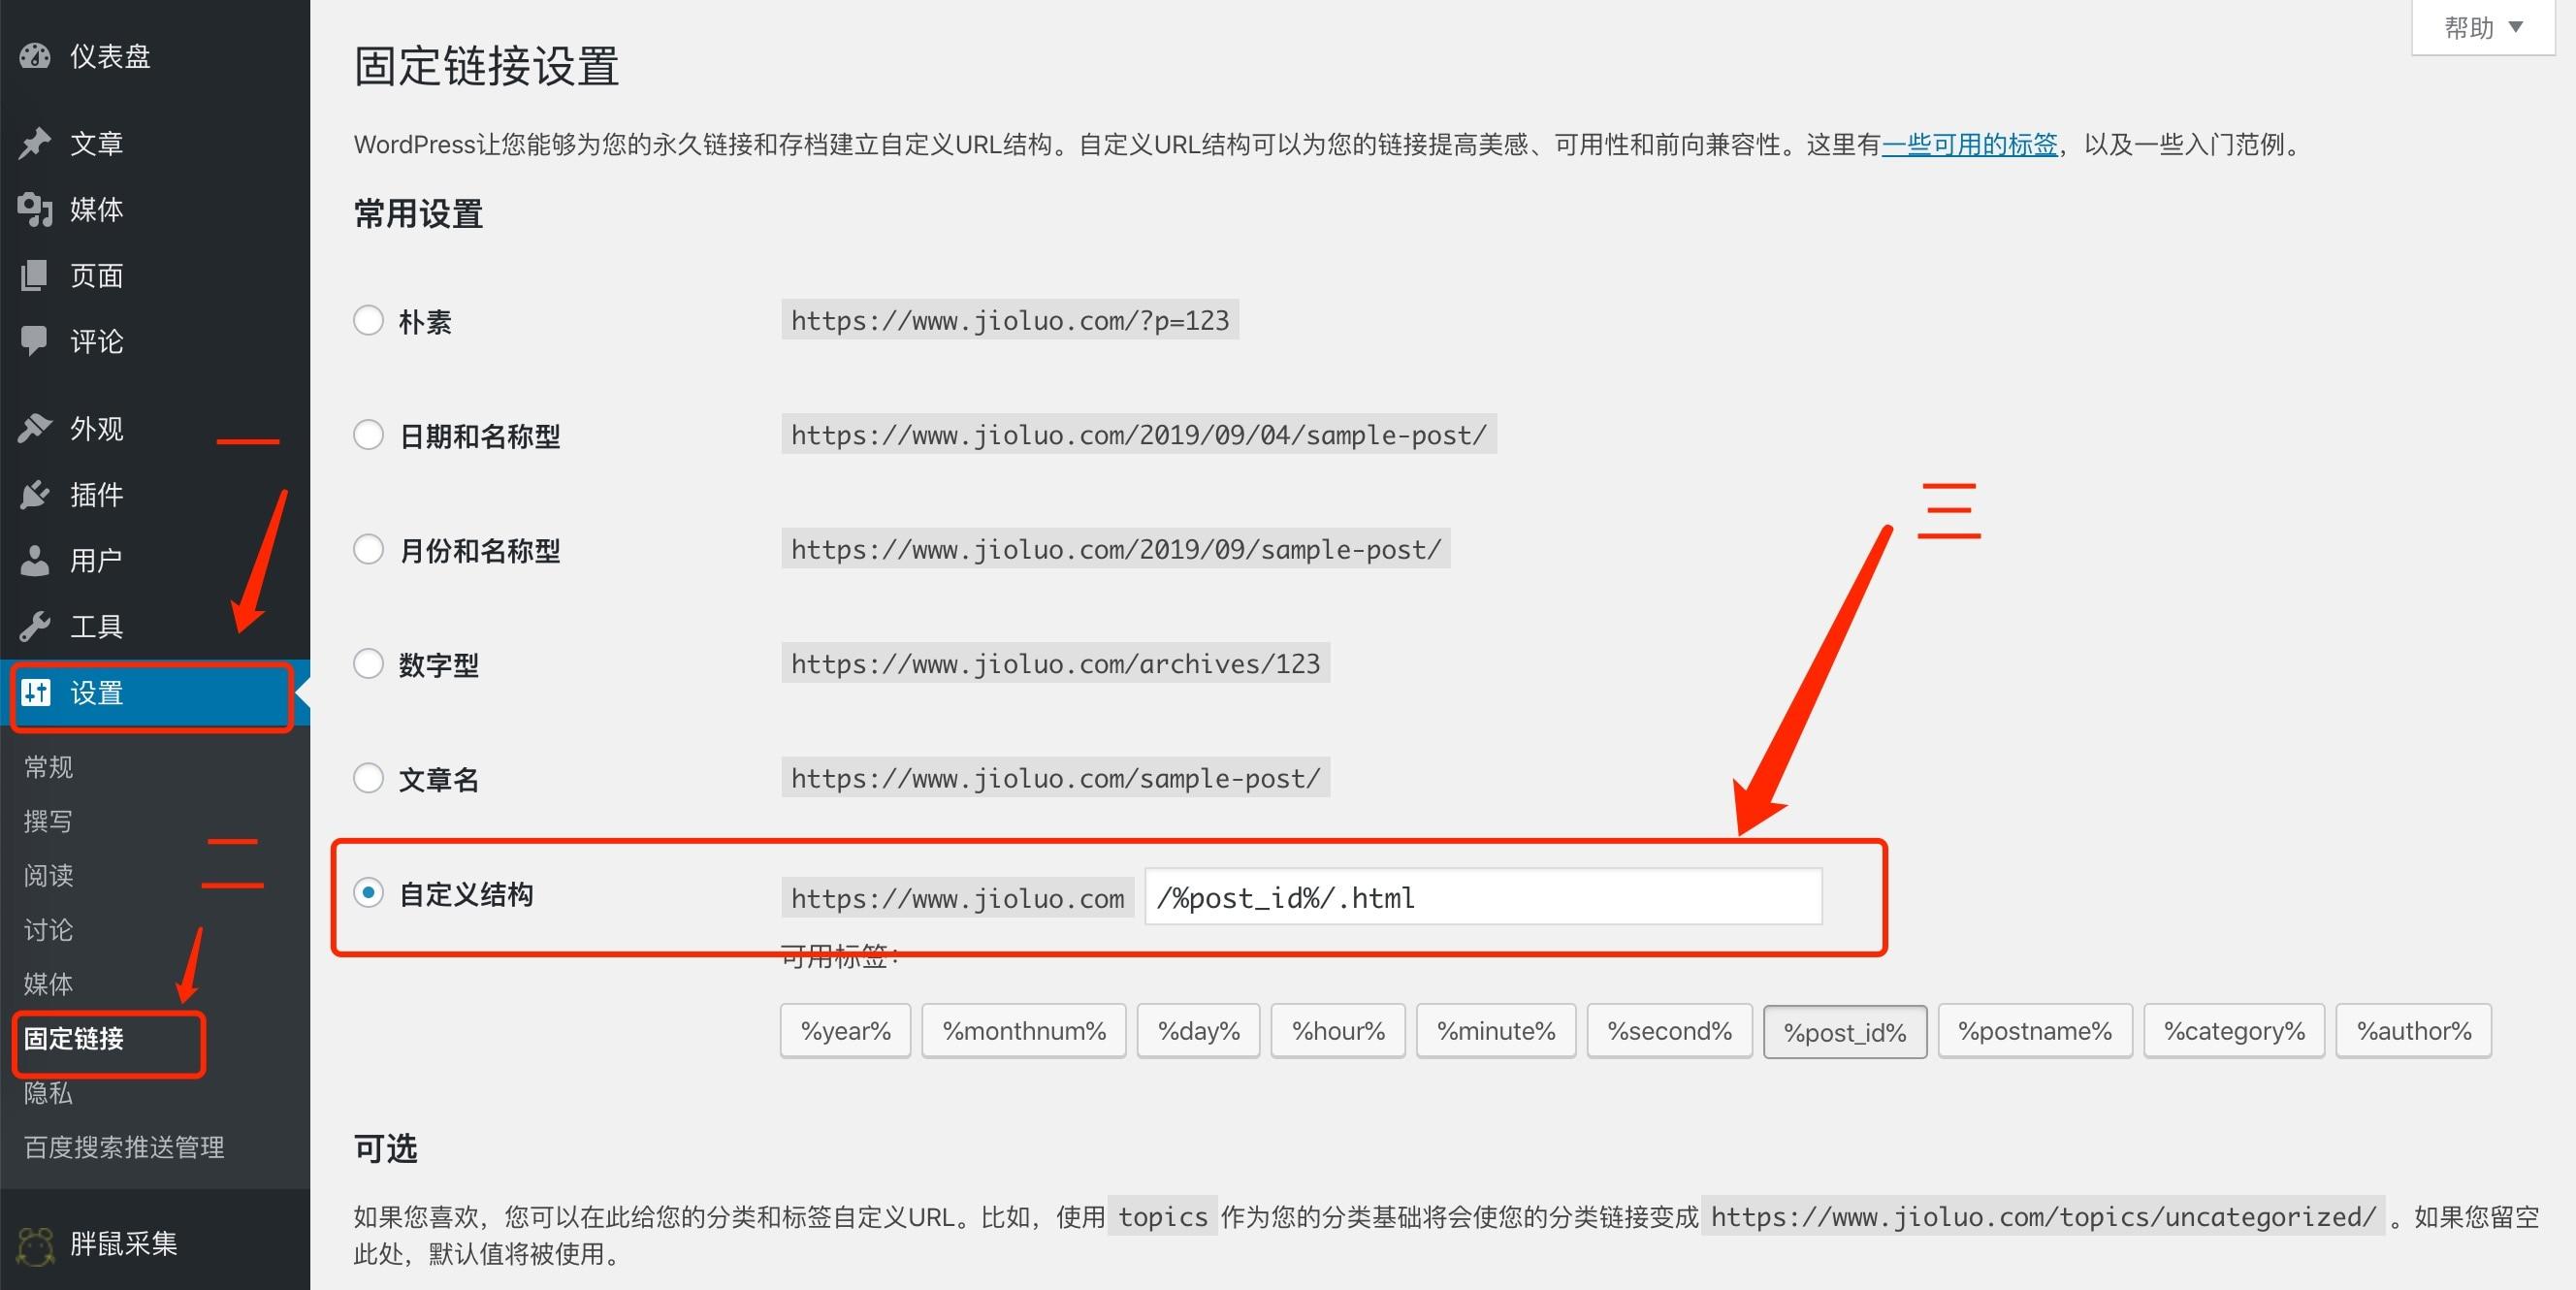 Hf68f3f3a9f76449aa909516131e427c7g - 针对WordPress固定链接设置为伪静态的方法